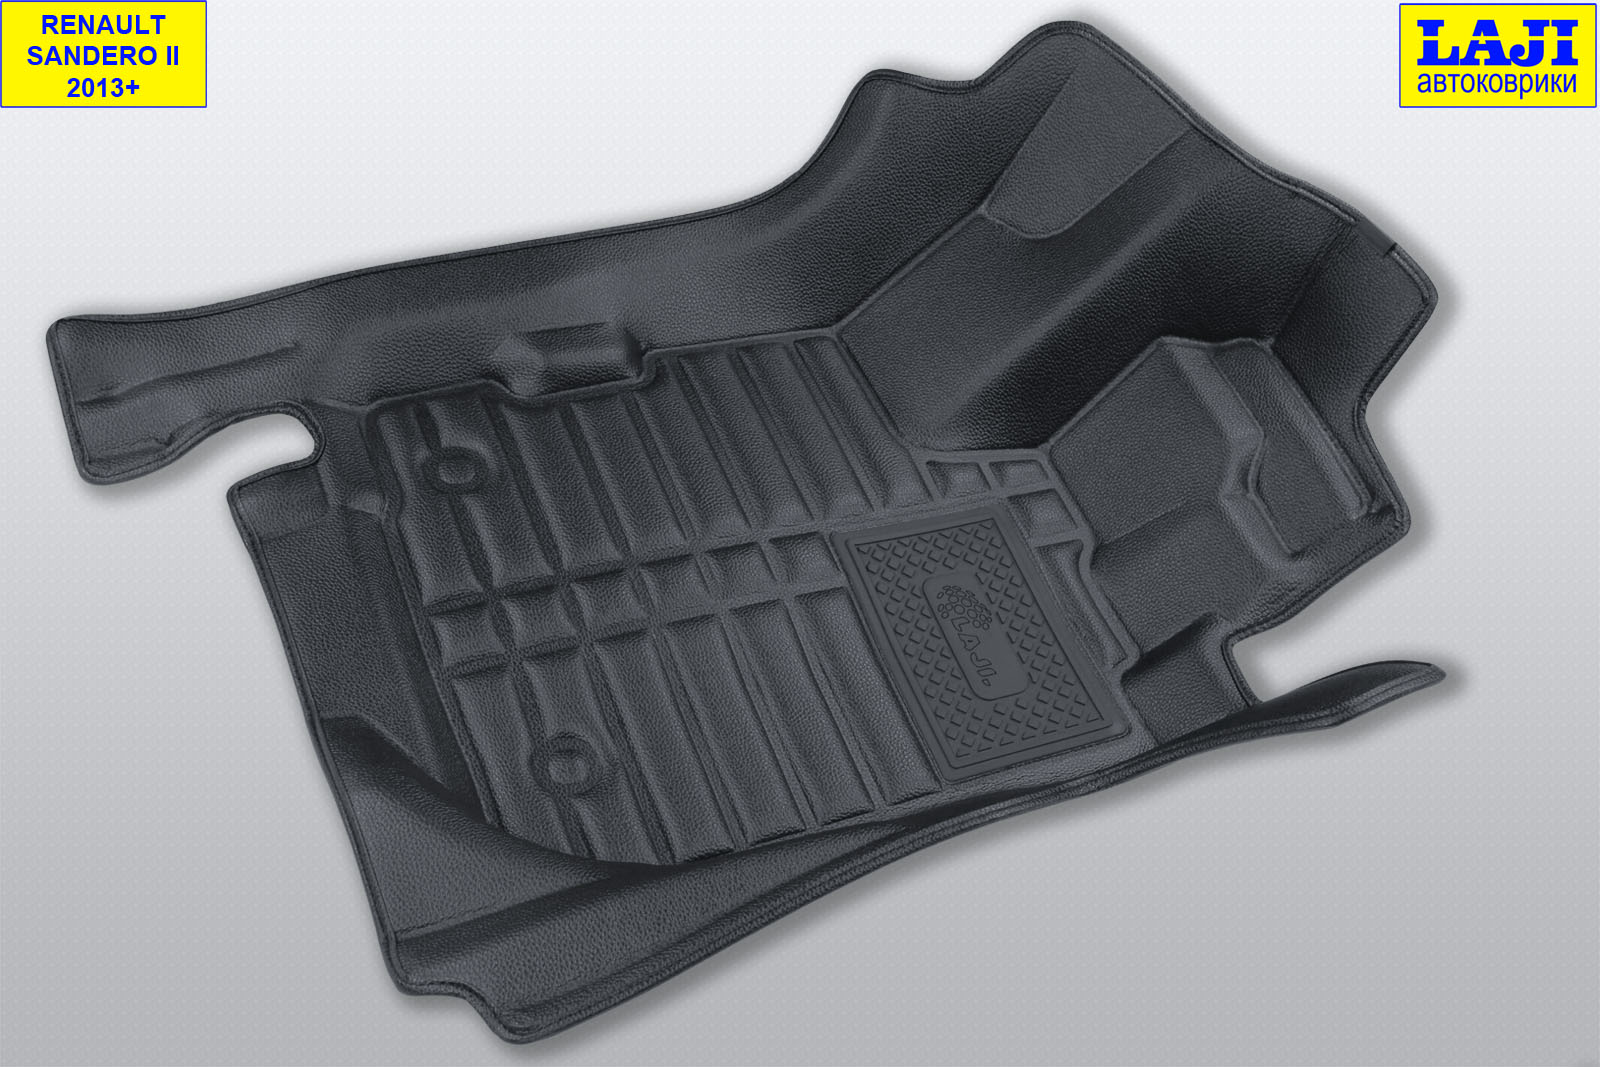 5D коврики в салон Renault Sandero 2 2014-н.в. 2